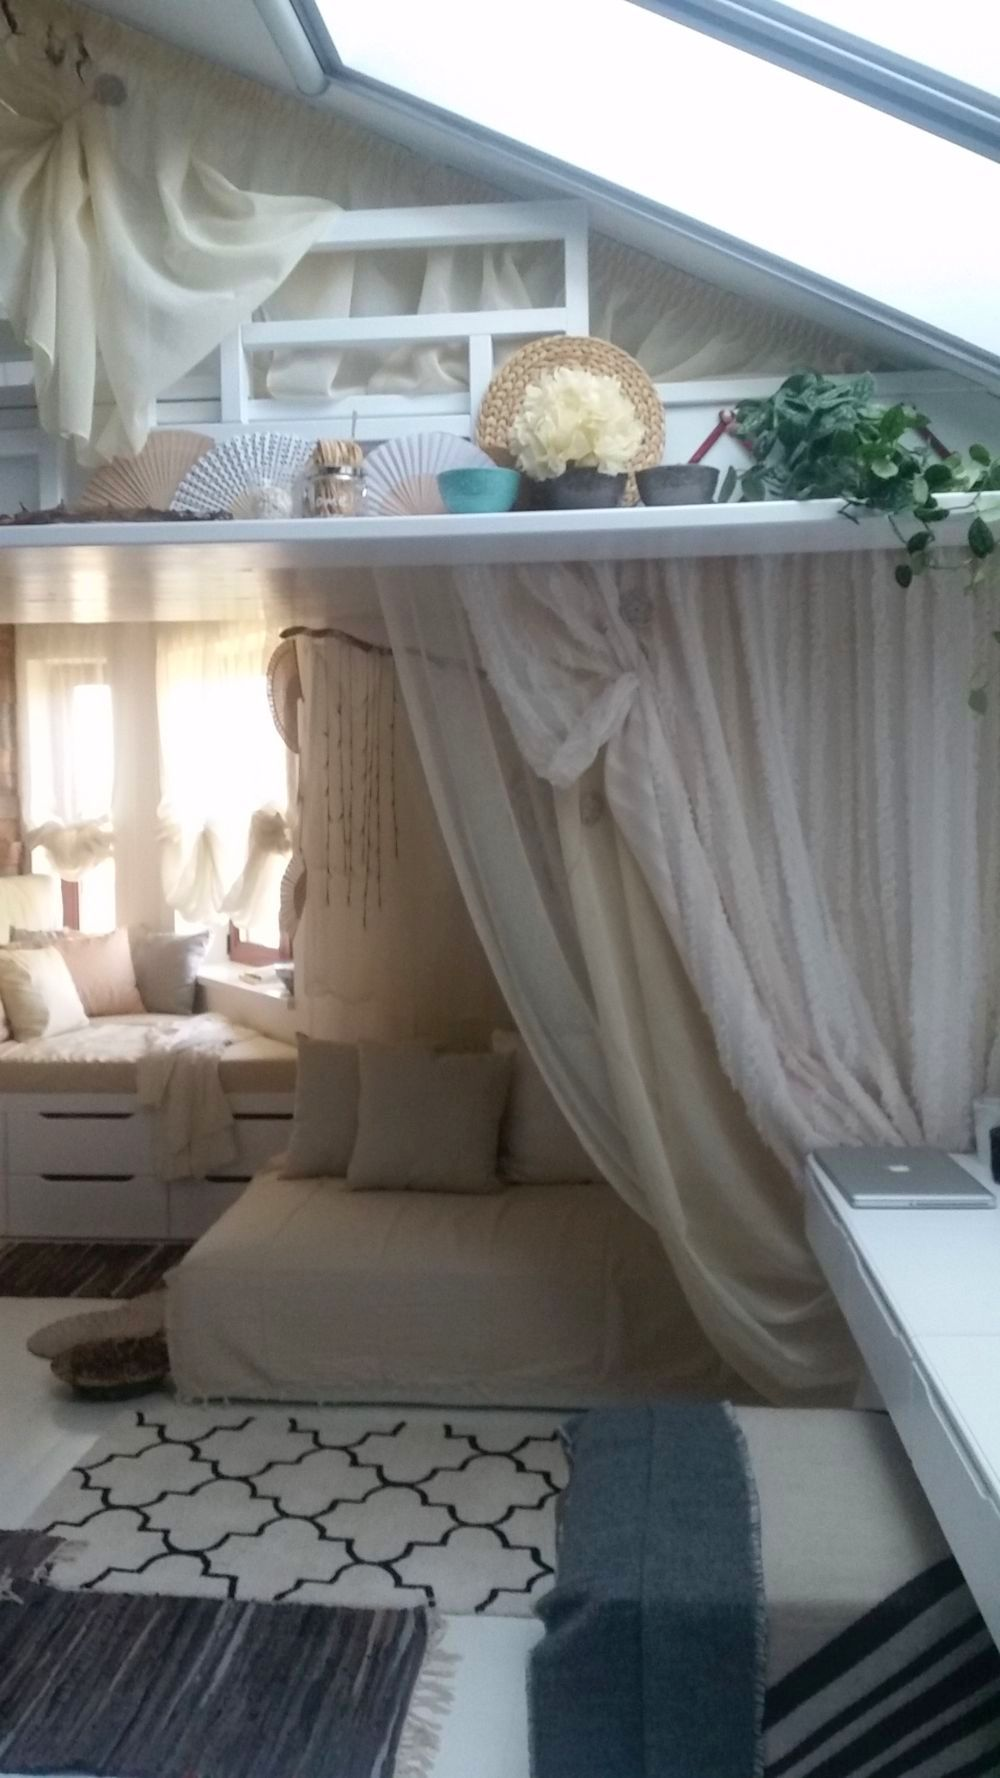 adelaparvu.com despre amenajare camera adolescenta Bucuresti, Romania, stil BoHo chic, Designer Adela Parvu, Foto Adela Parvu (28)